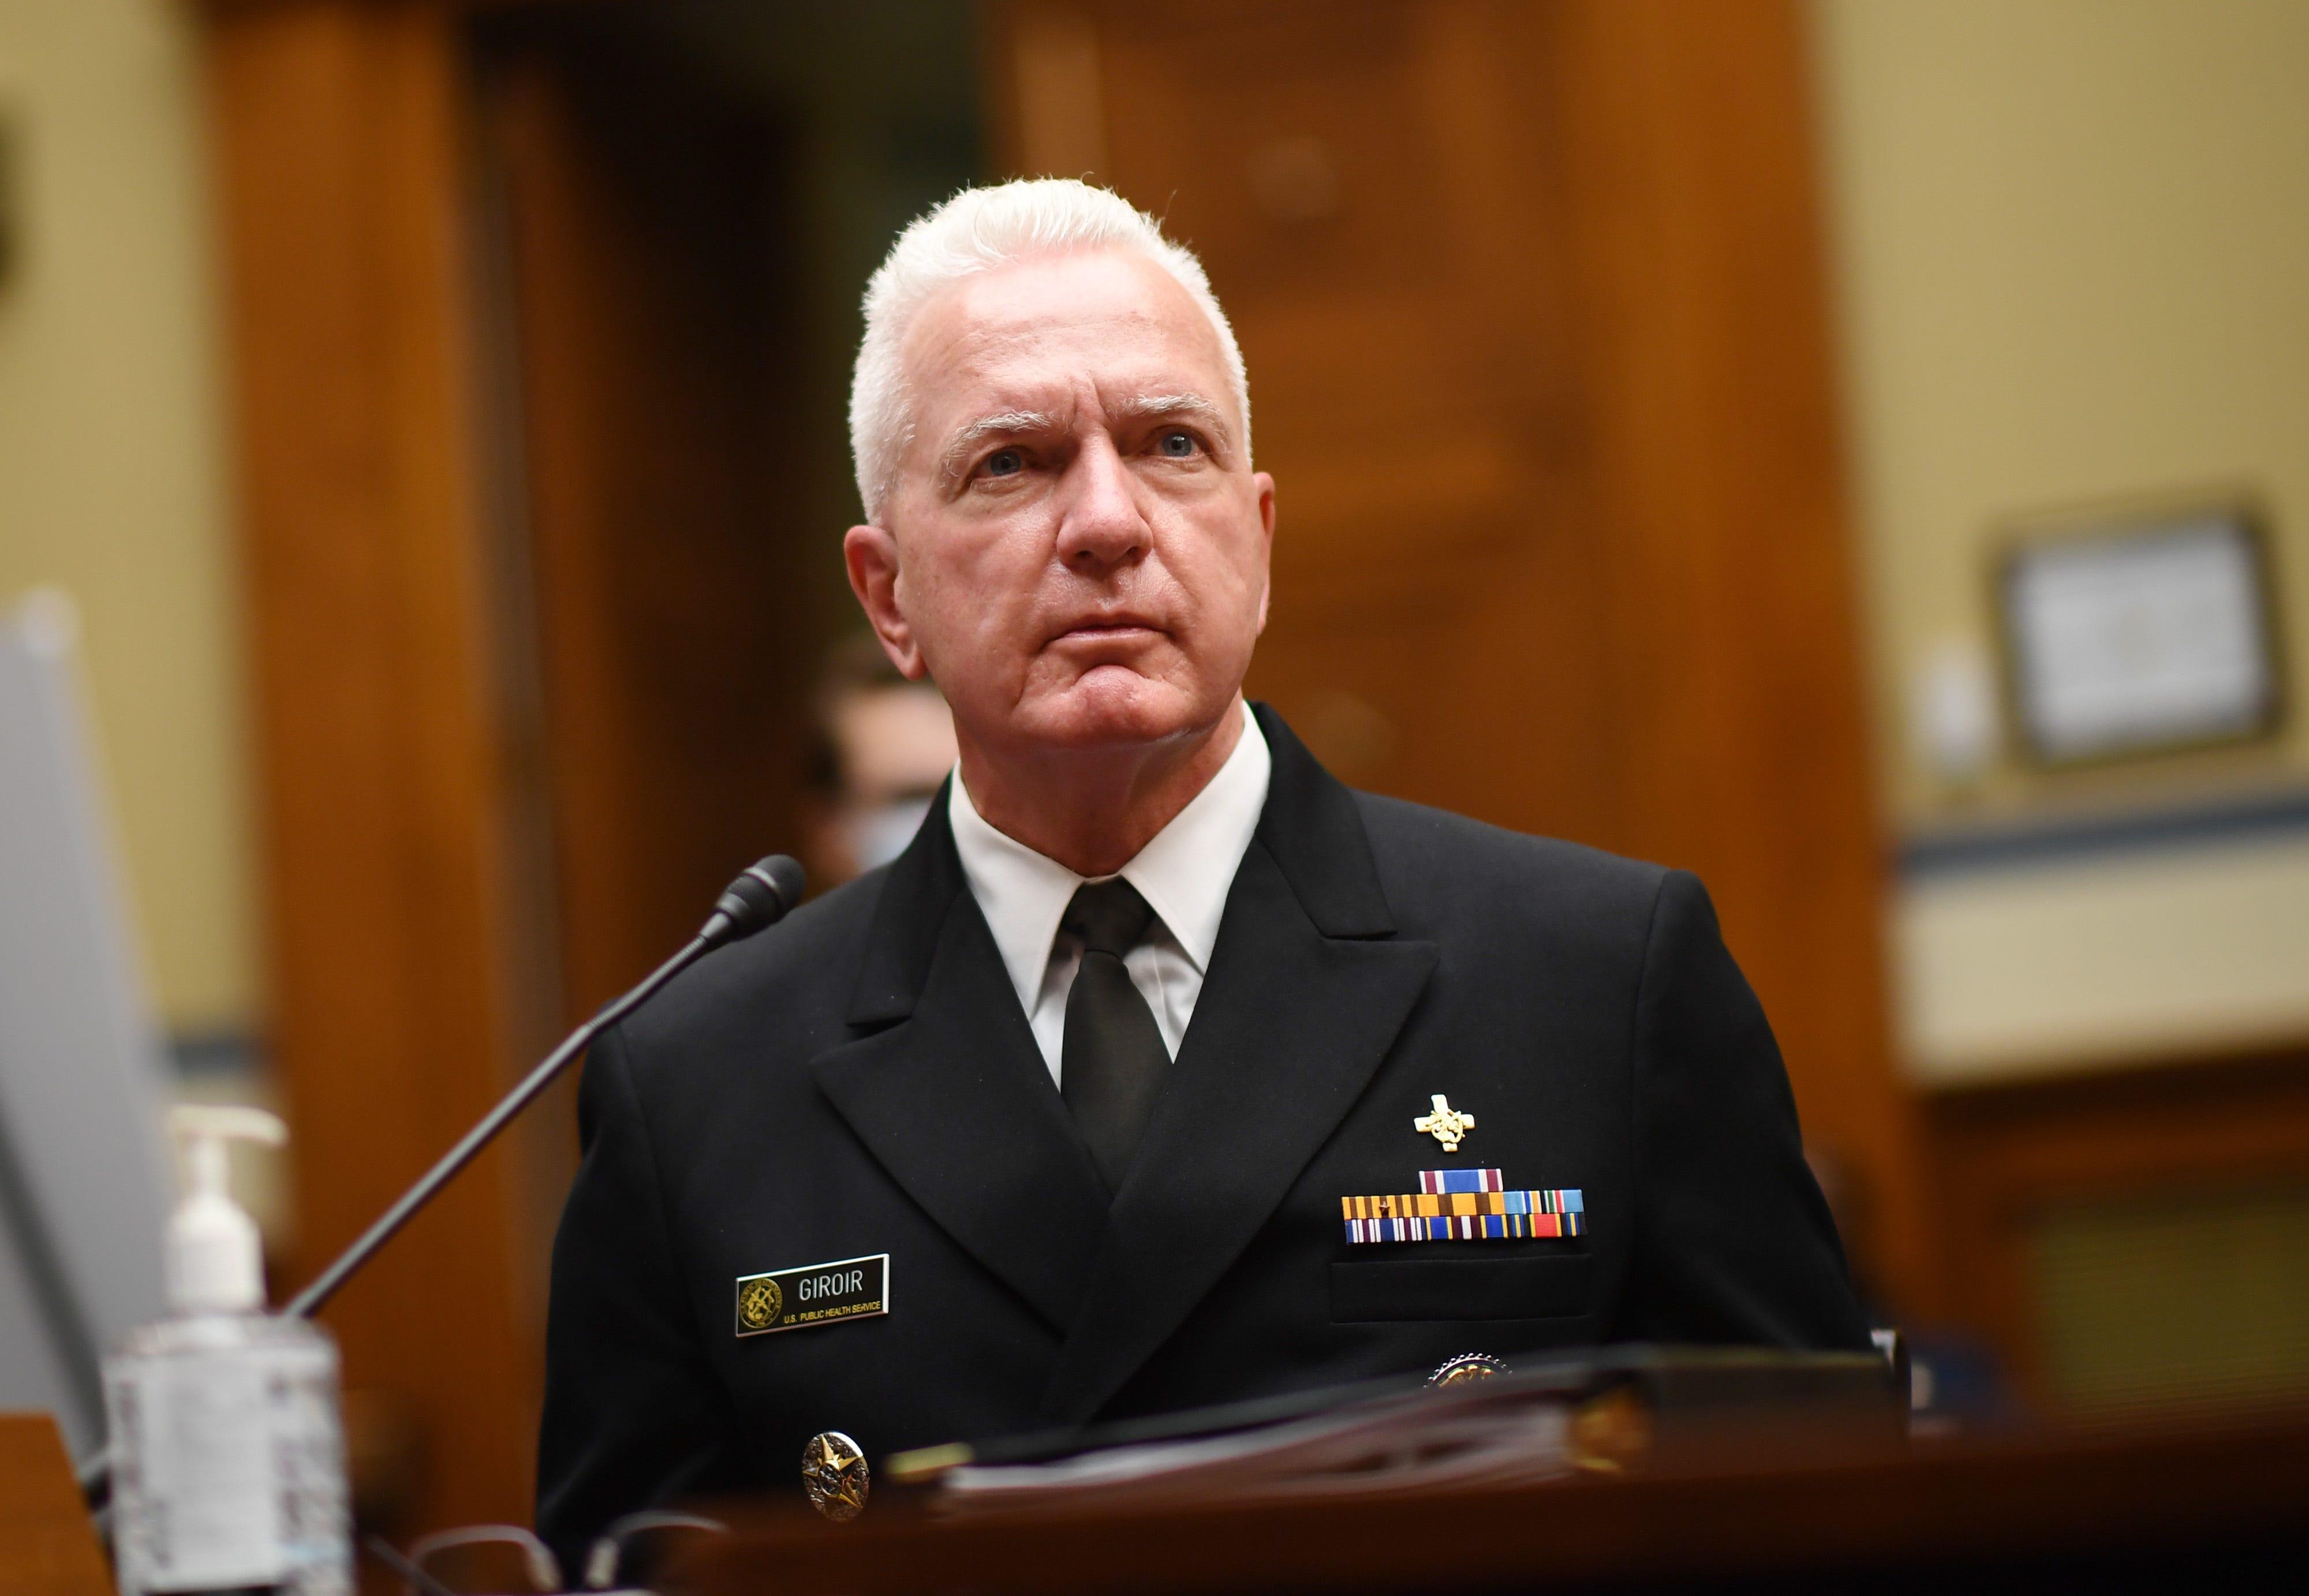 Hydroxychloroquine not effective, time to  move on:  White House coronavirus testing chief Giroir